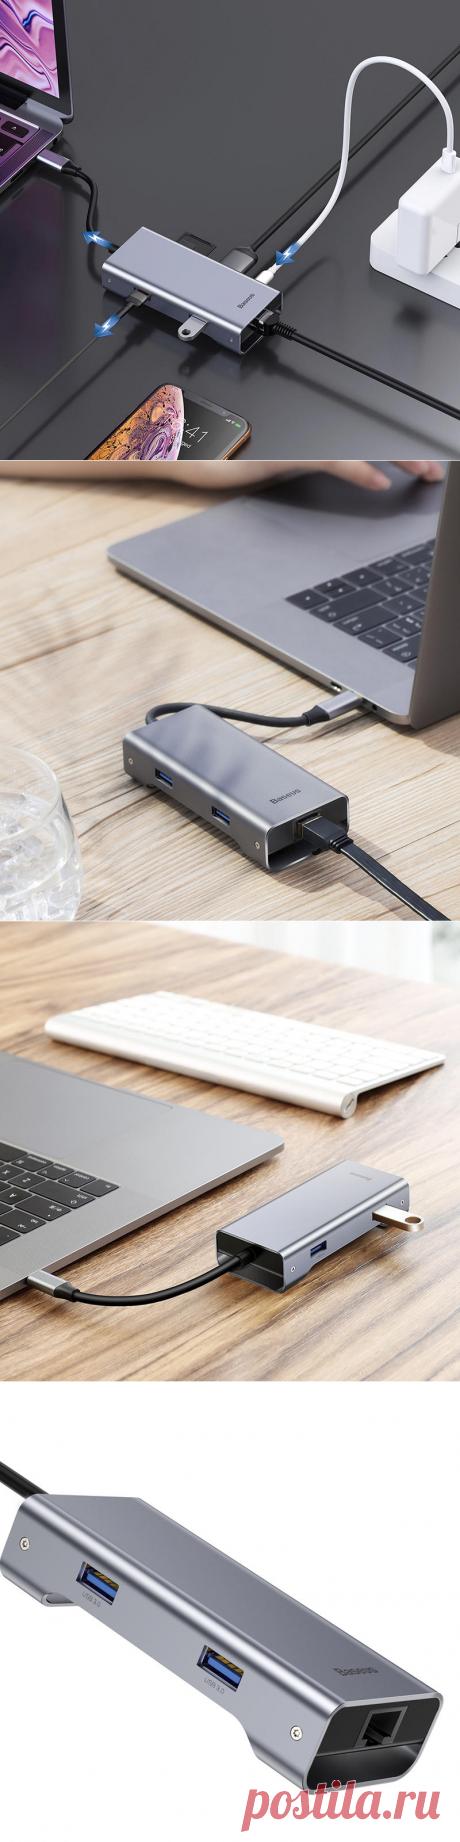 baseus 7-in-1 usb-c type-c usb hub adapter with 2 usb 3.0 ports/usb-c pd charging port/rj45 gigabit ethernet port/4k hd/memory card reader Sale